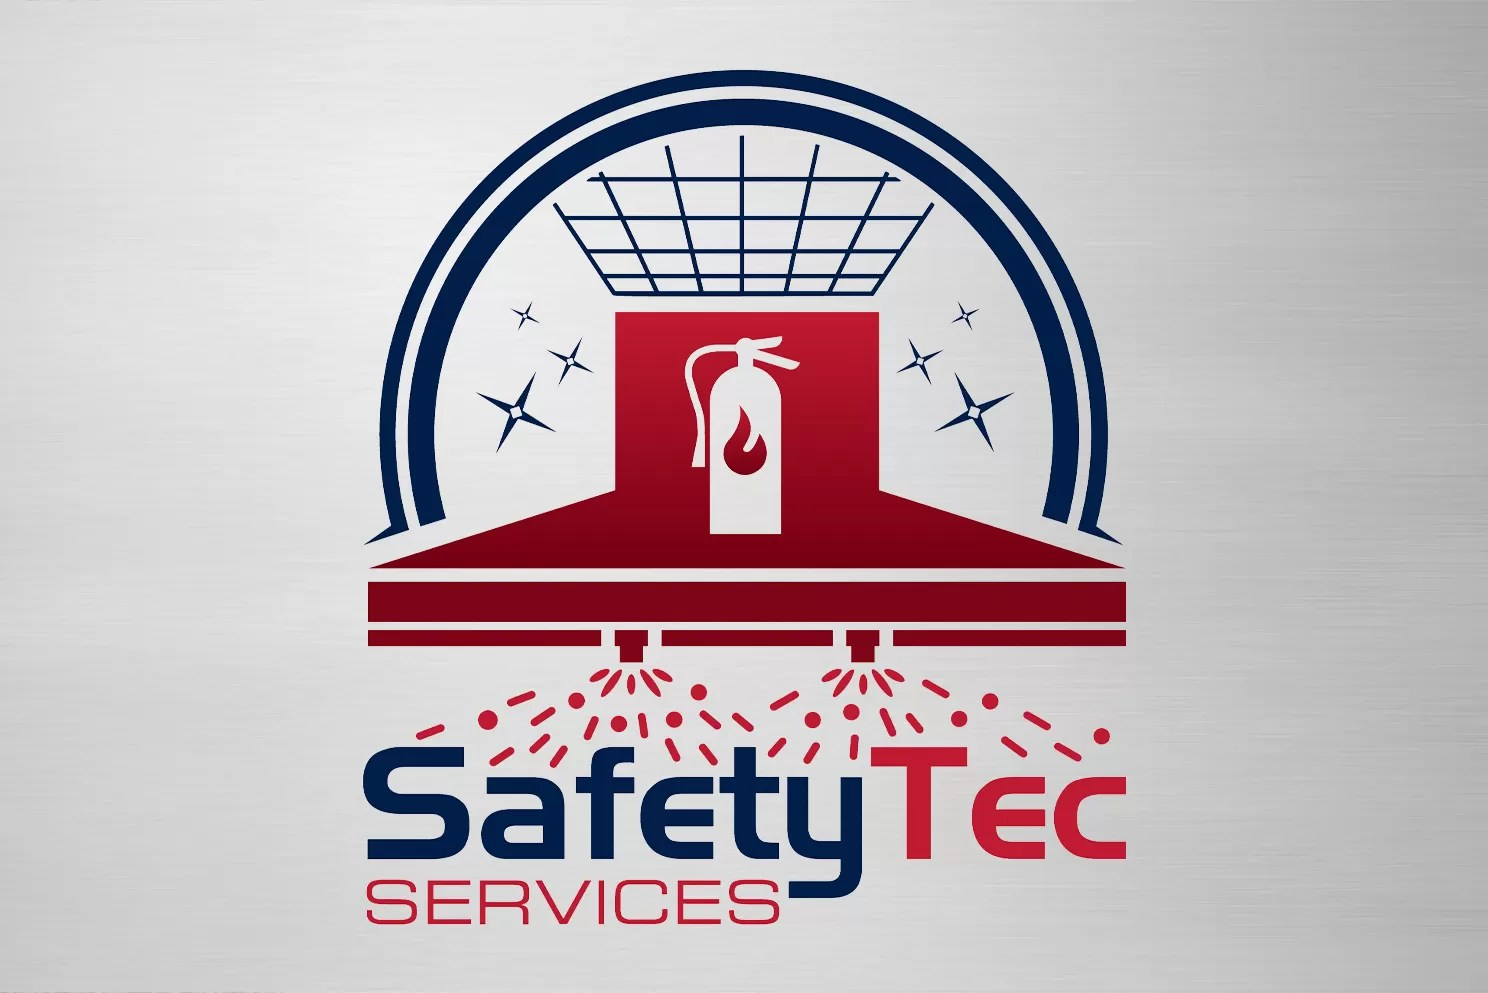 SafetyTec Services logo